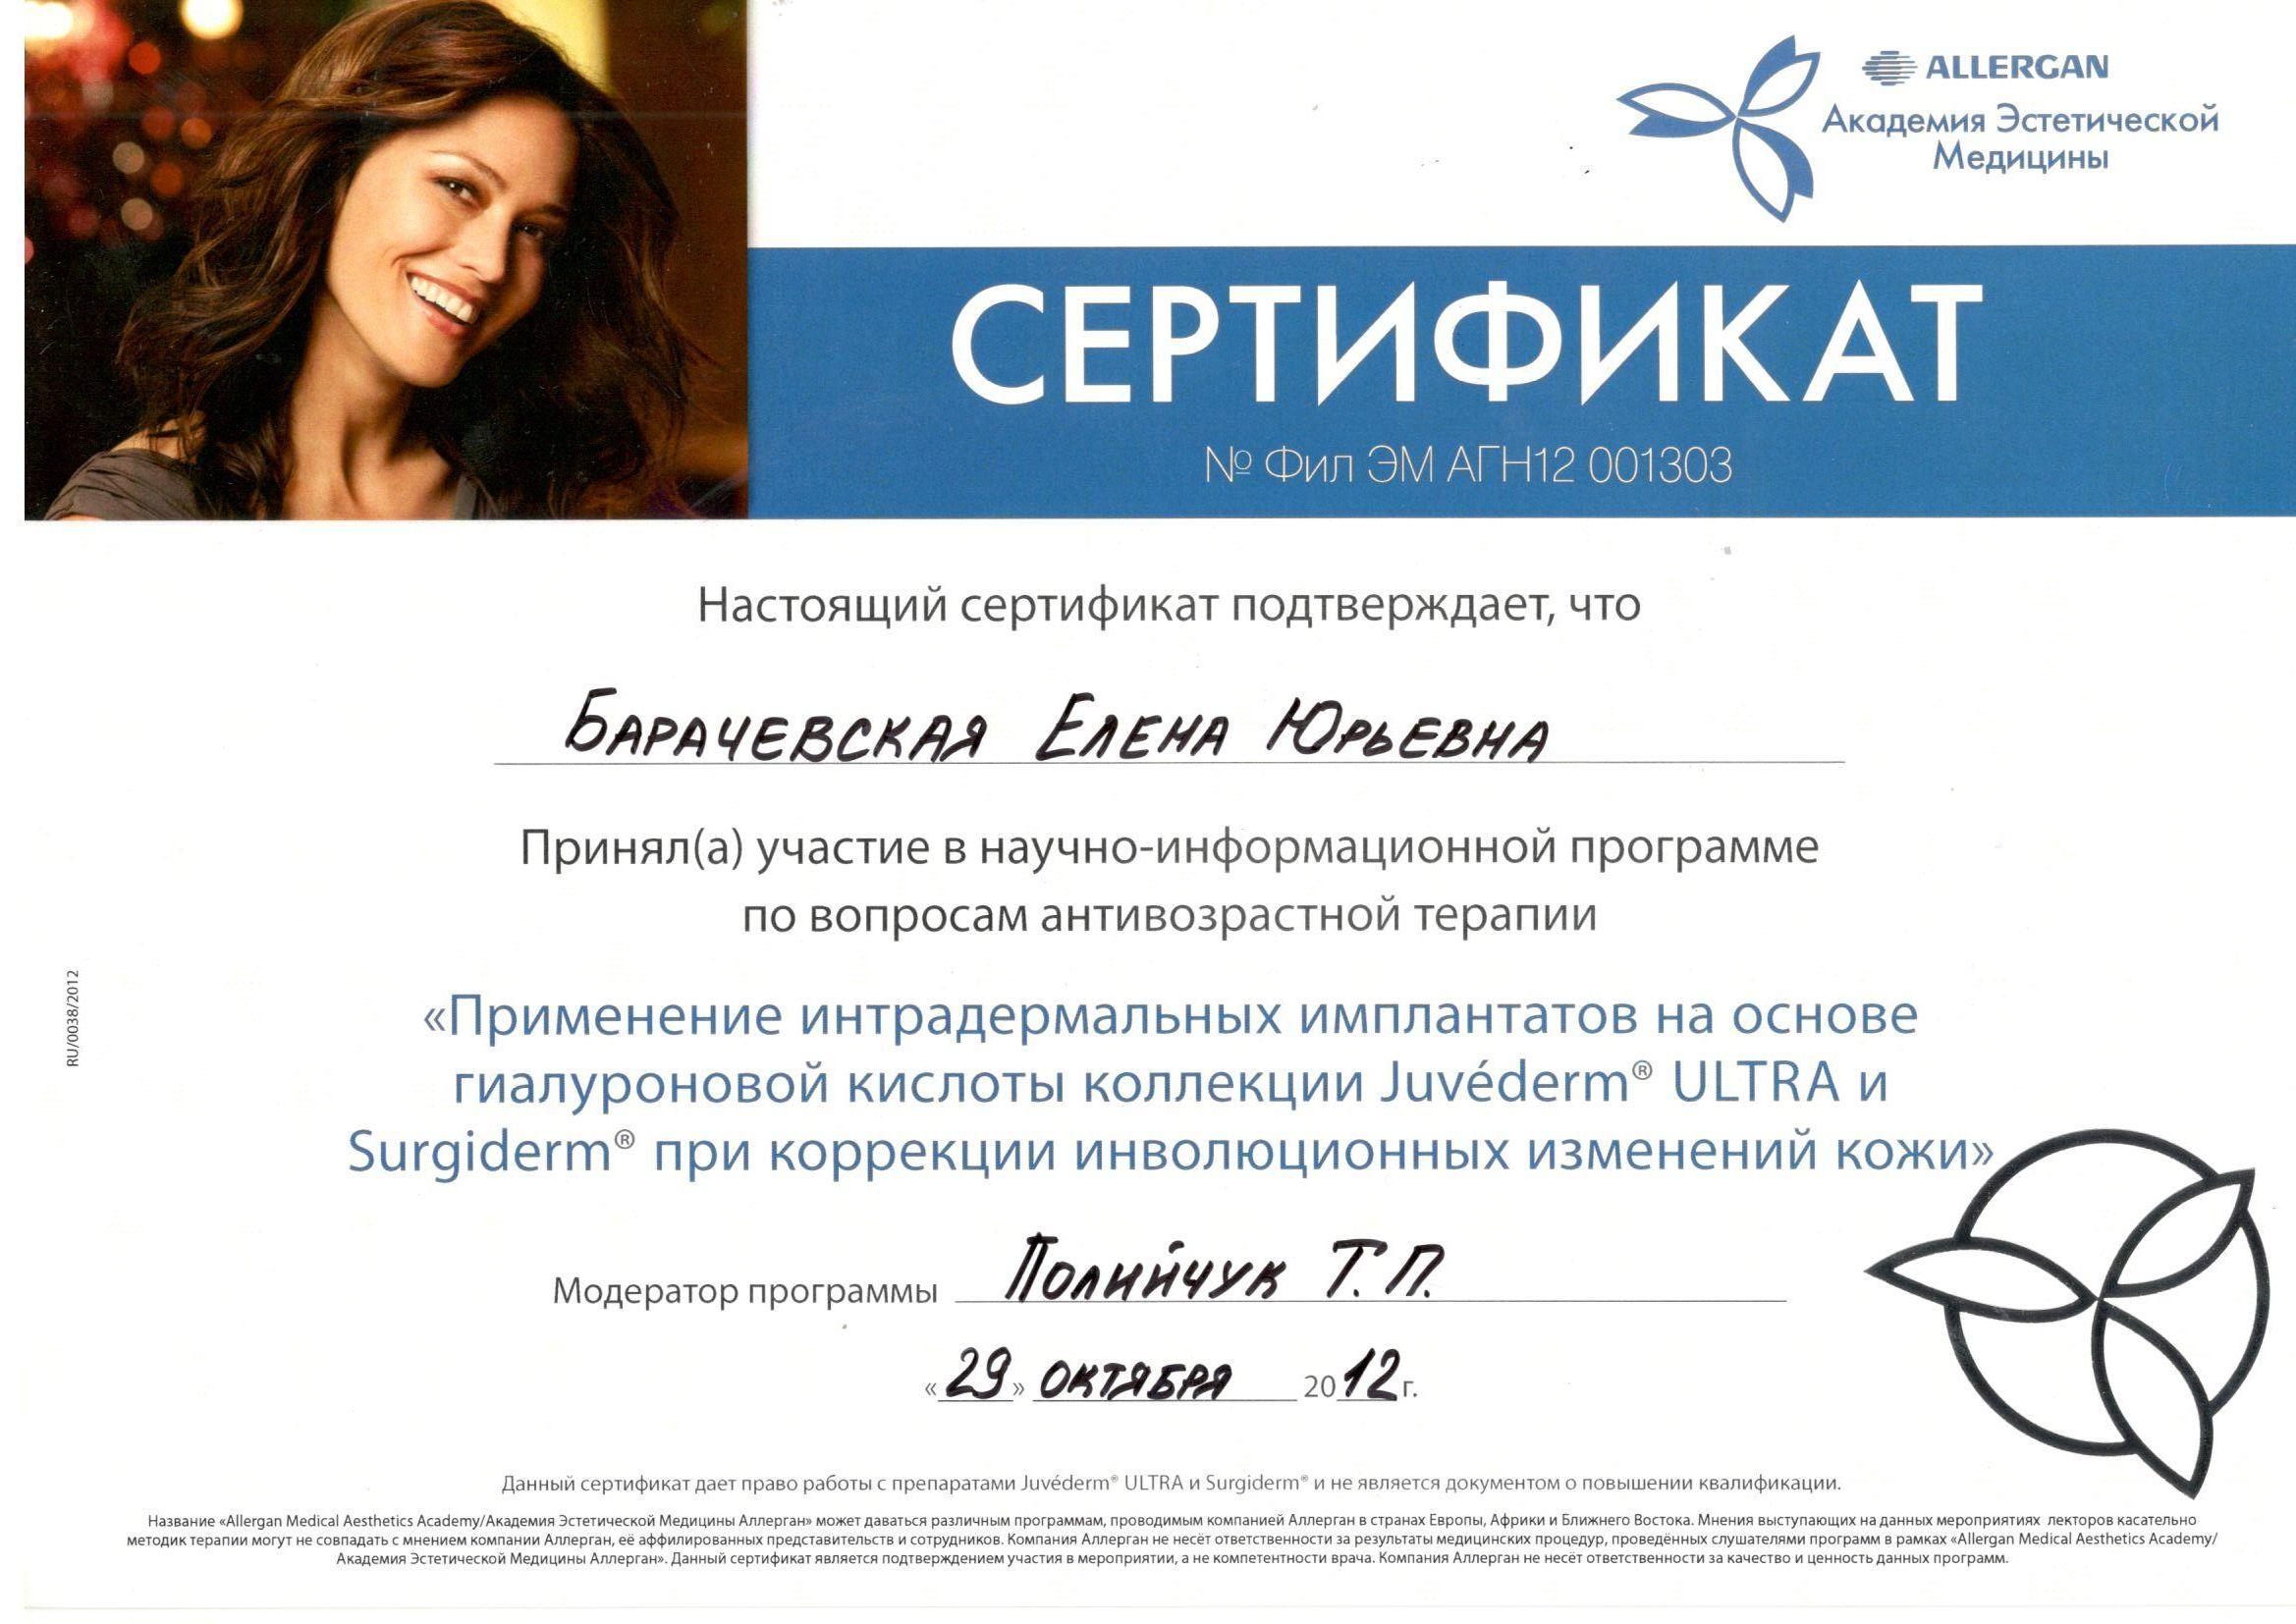 KOSMETOLOGIYA BARACHEVSKAYA Page